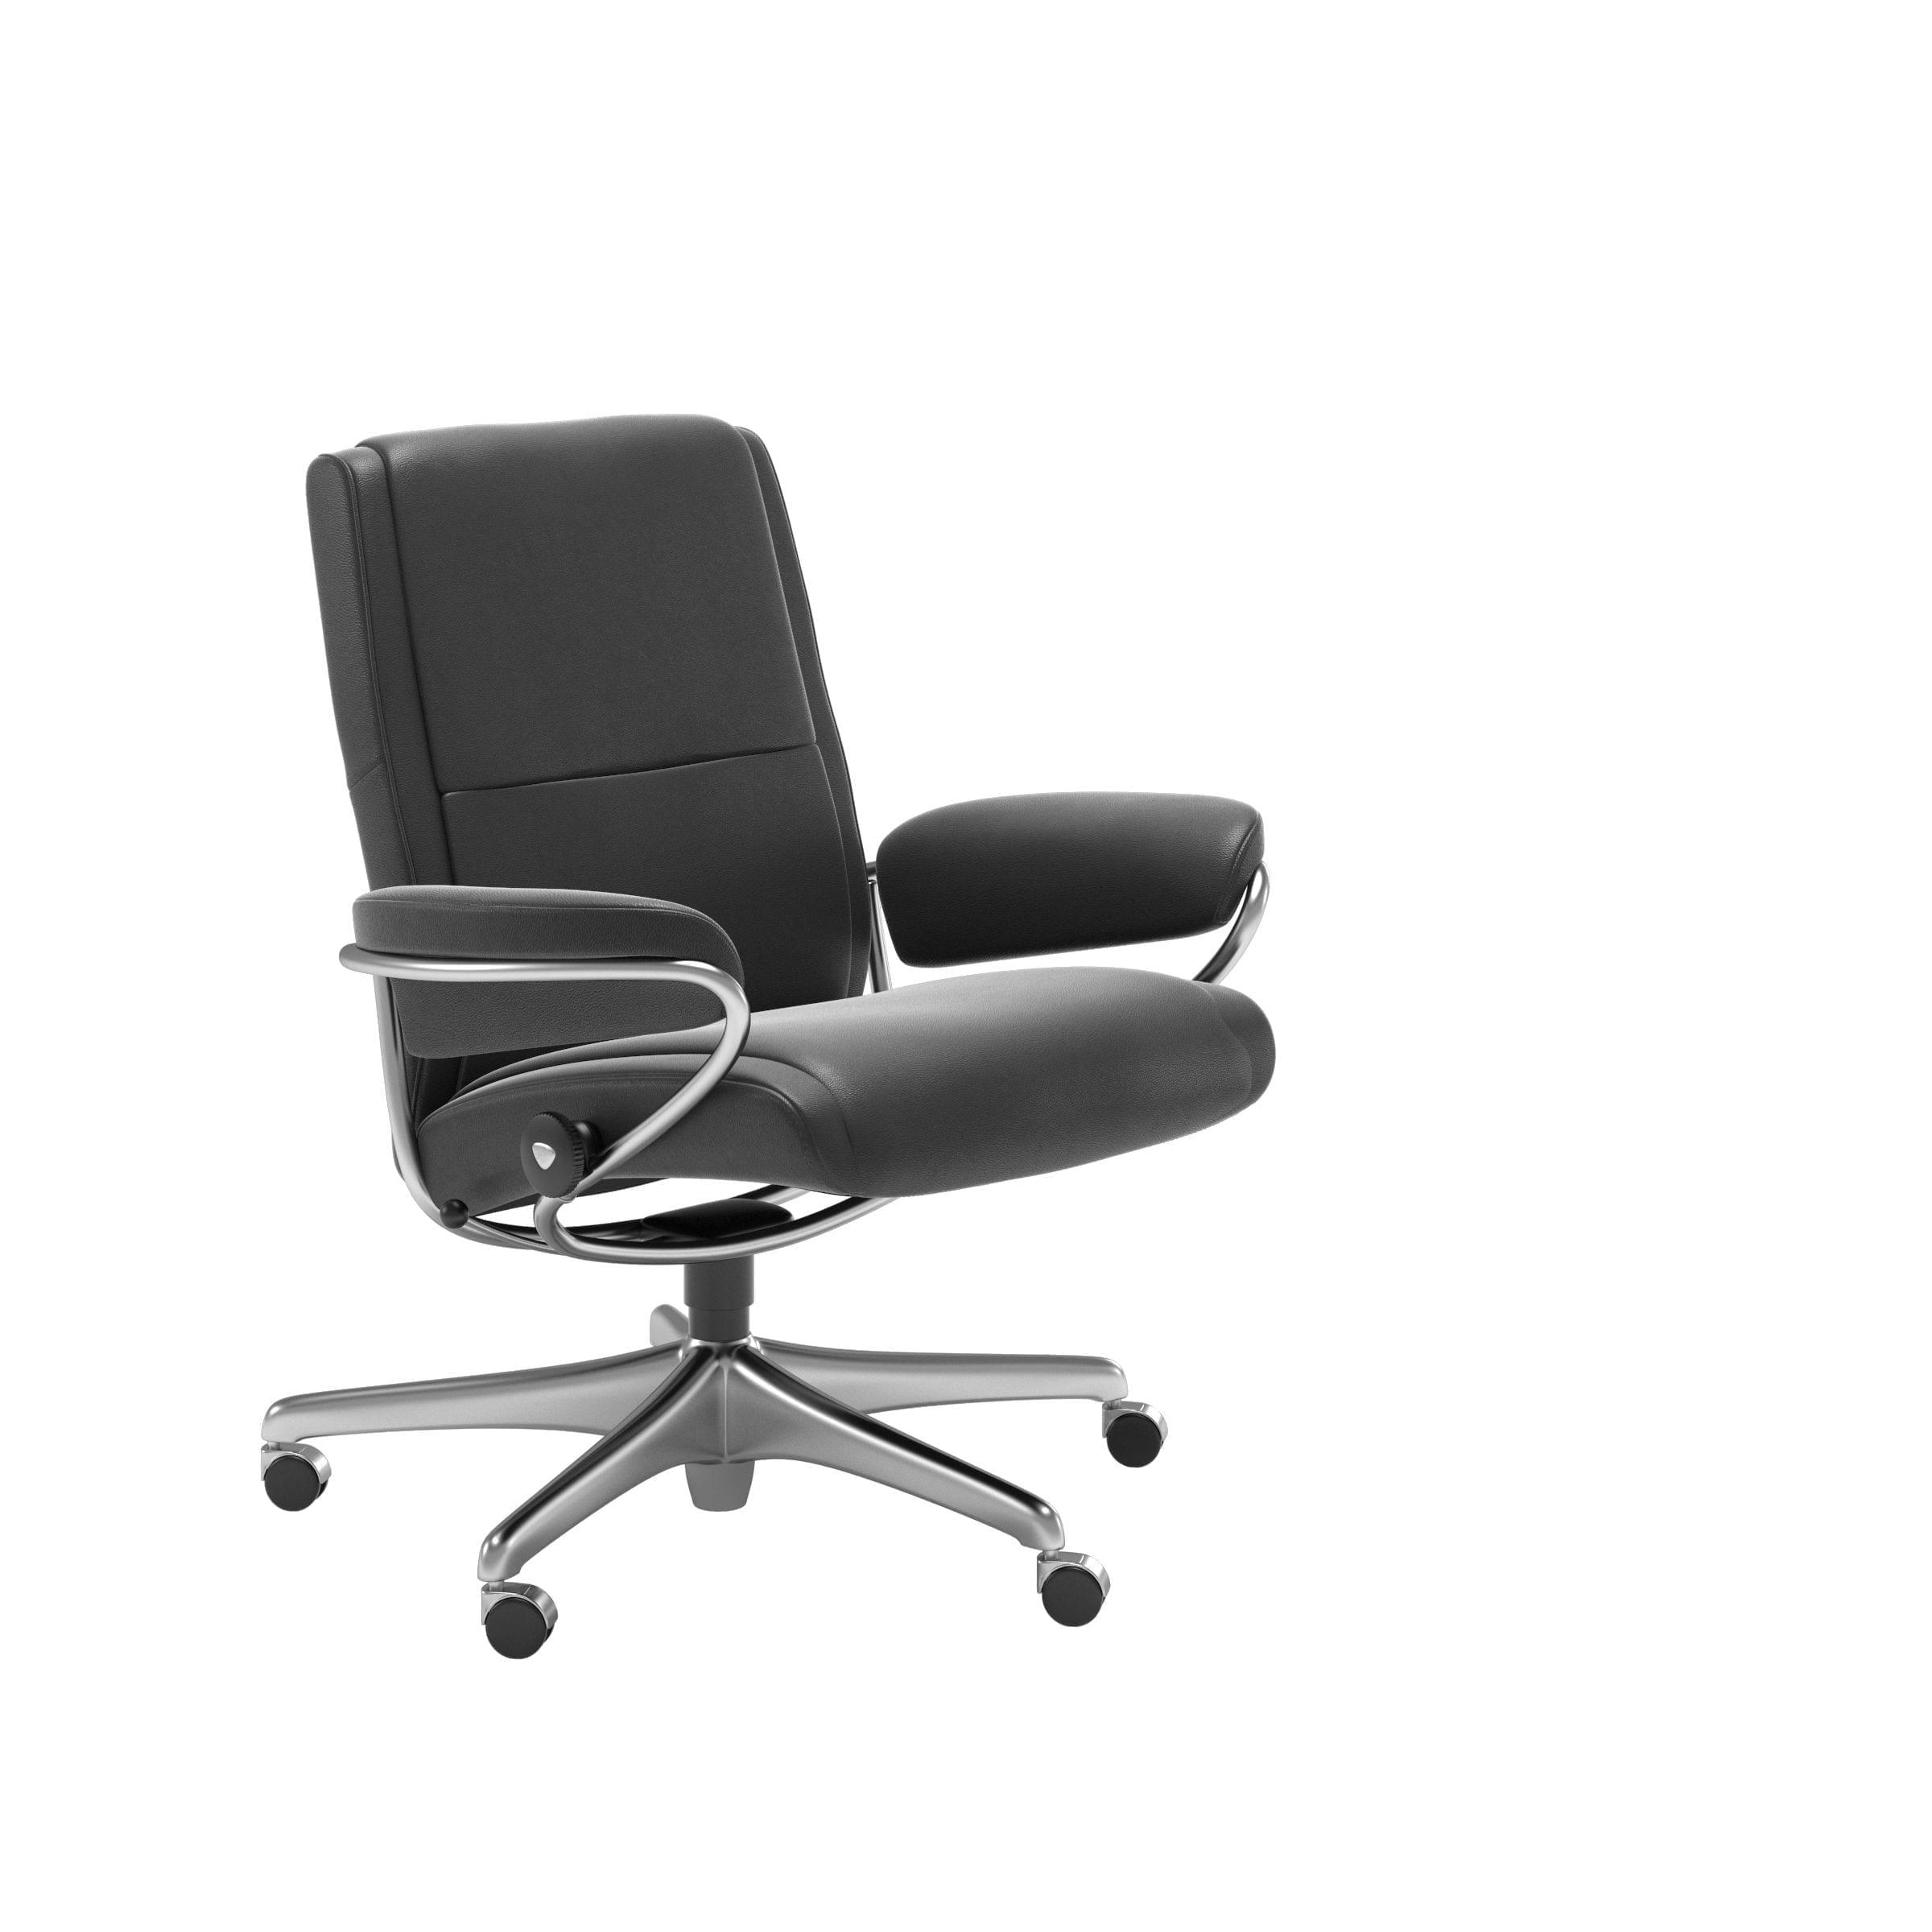 Office Chair Low Back Paris Stressless 1